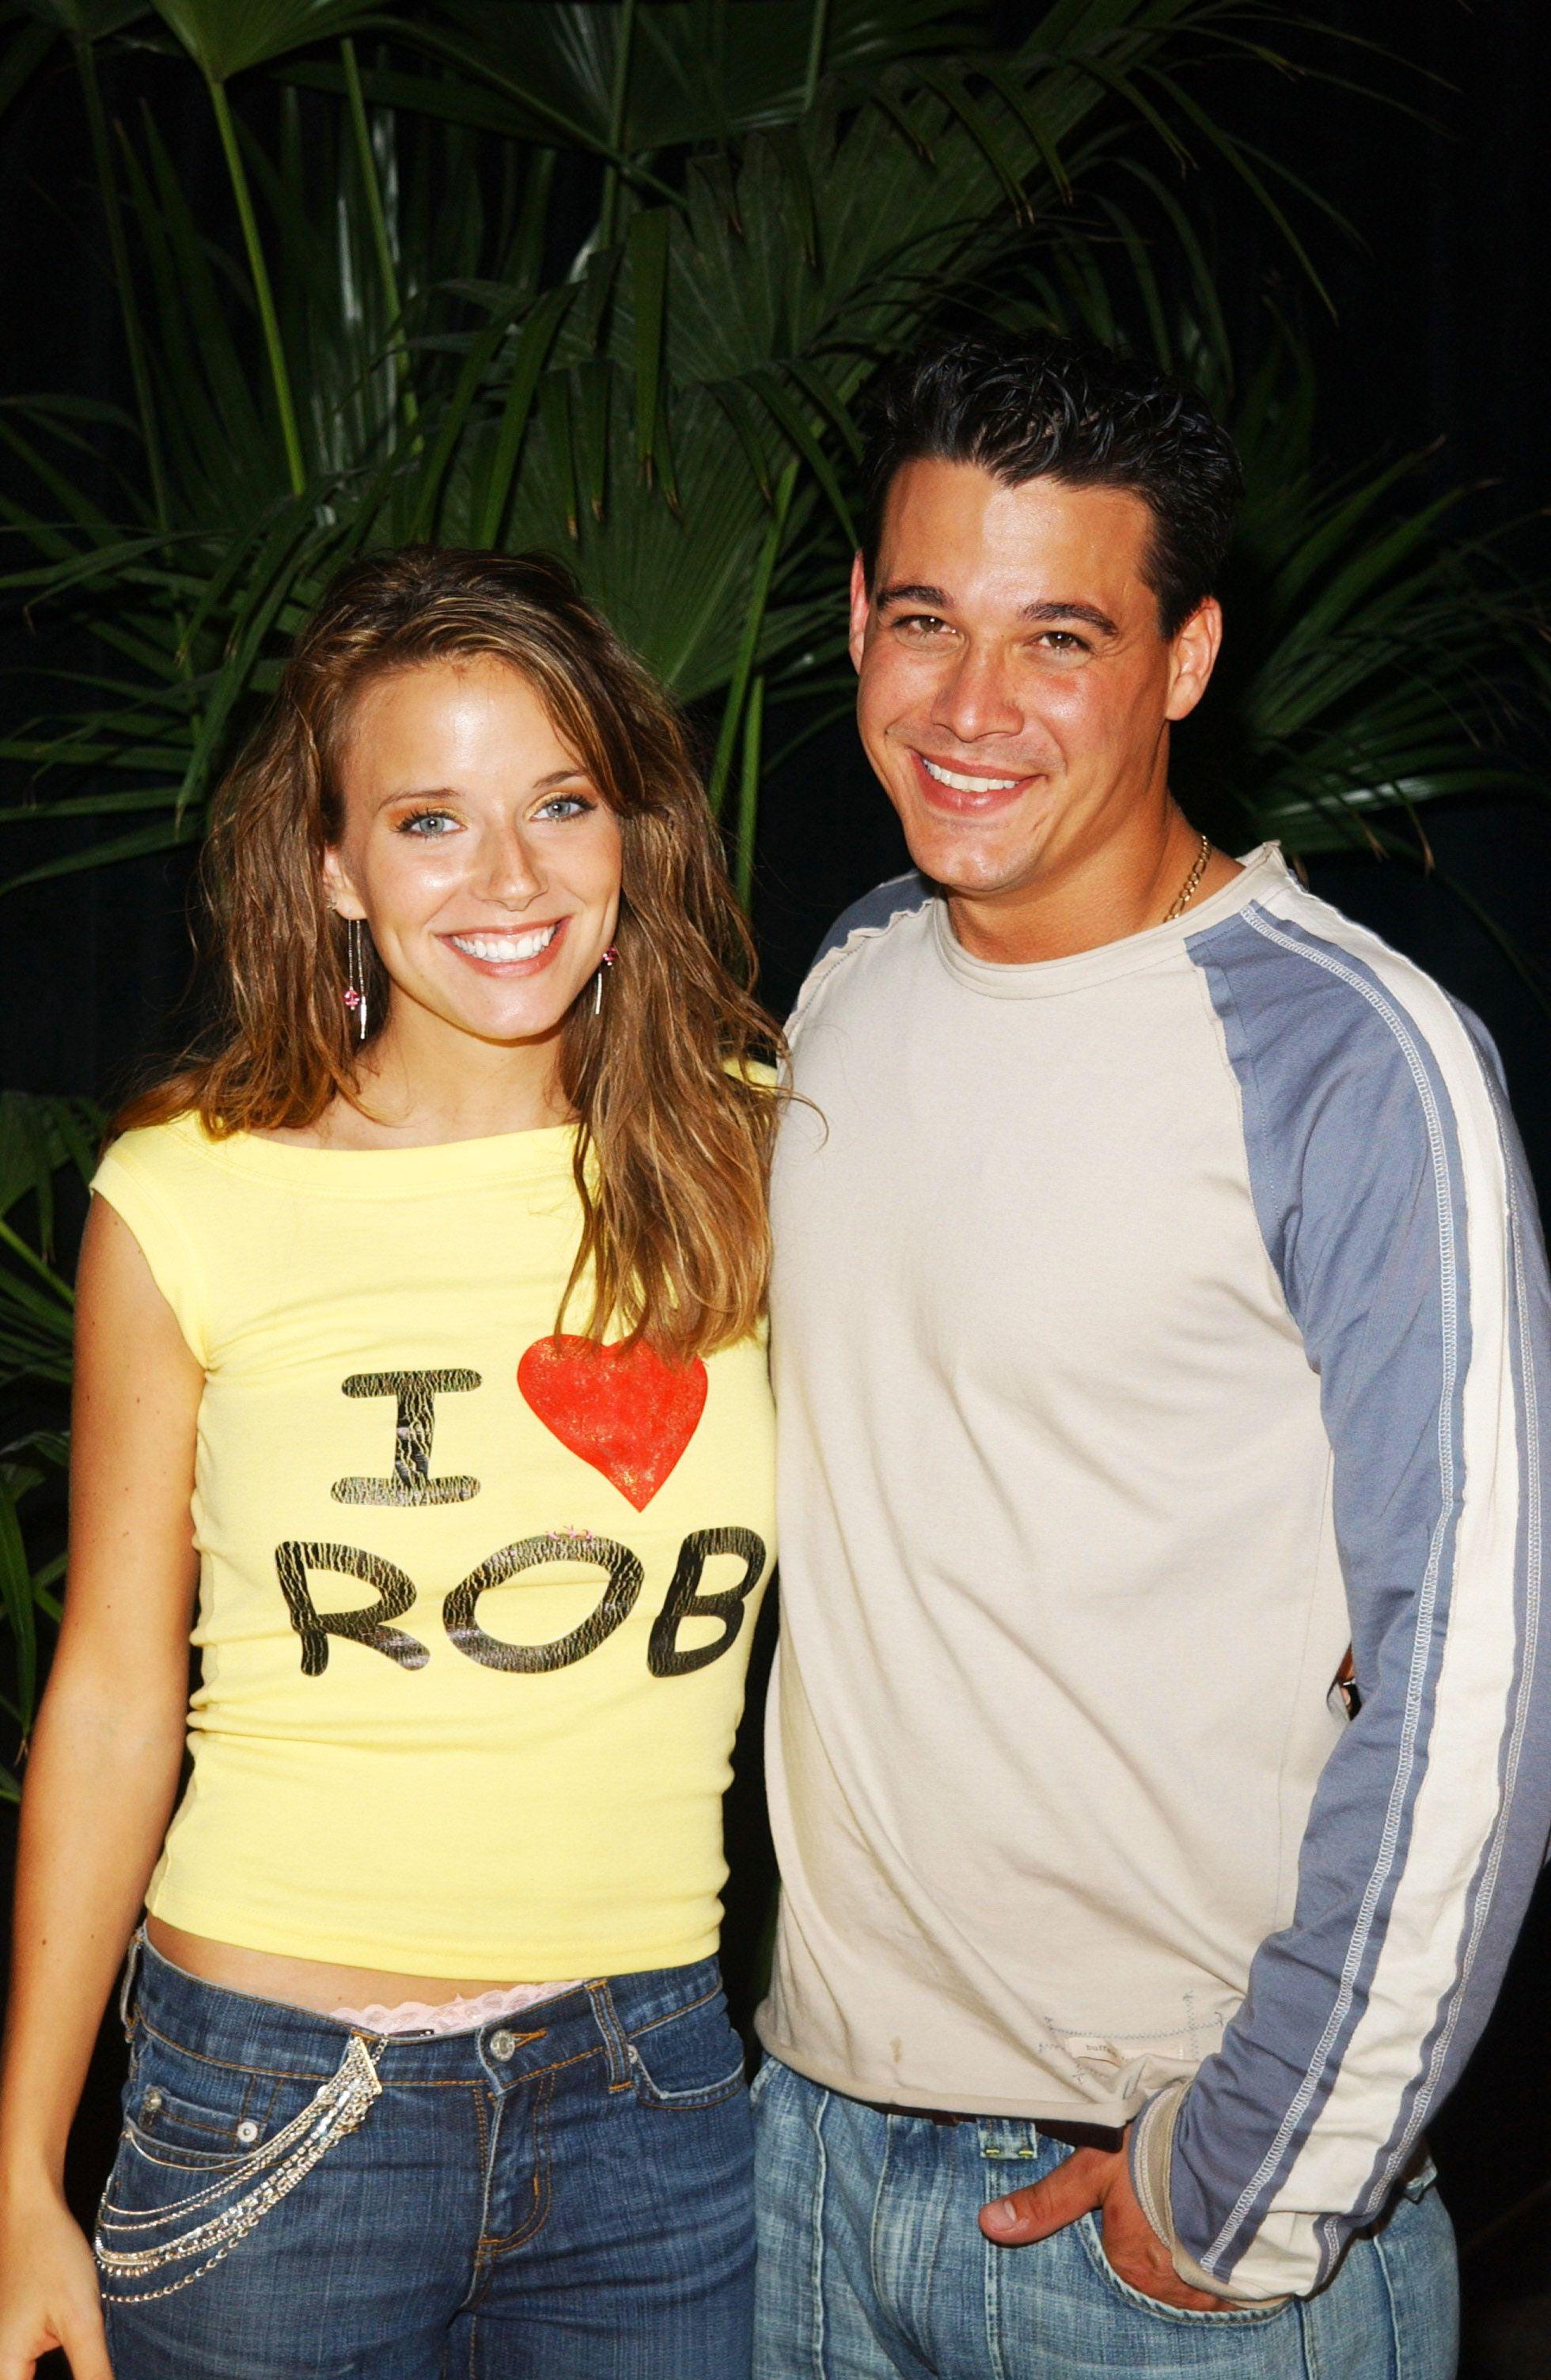 Is Survivor's Boston Rob Still Married to Amber Brkich?